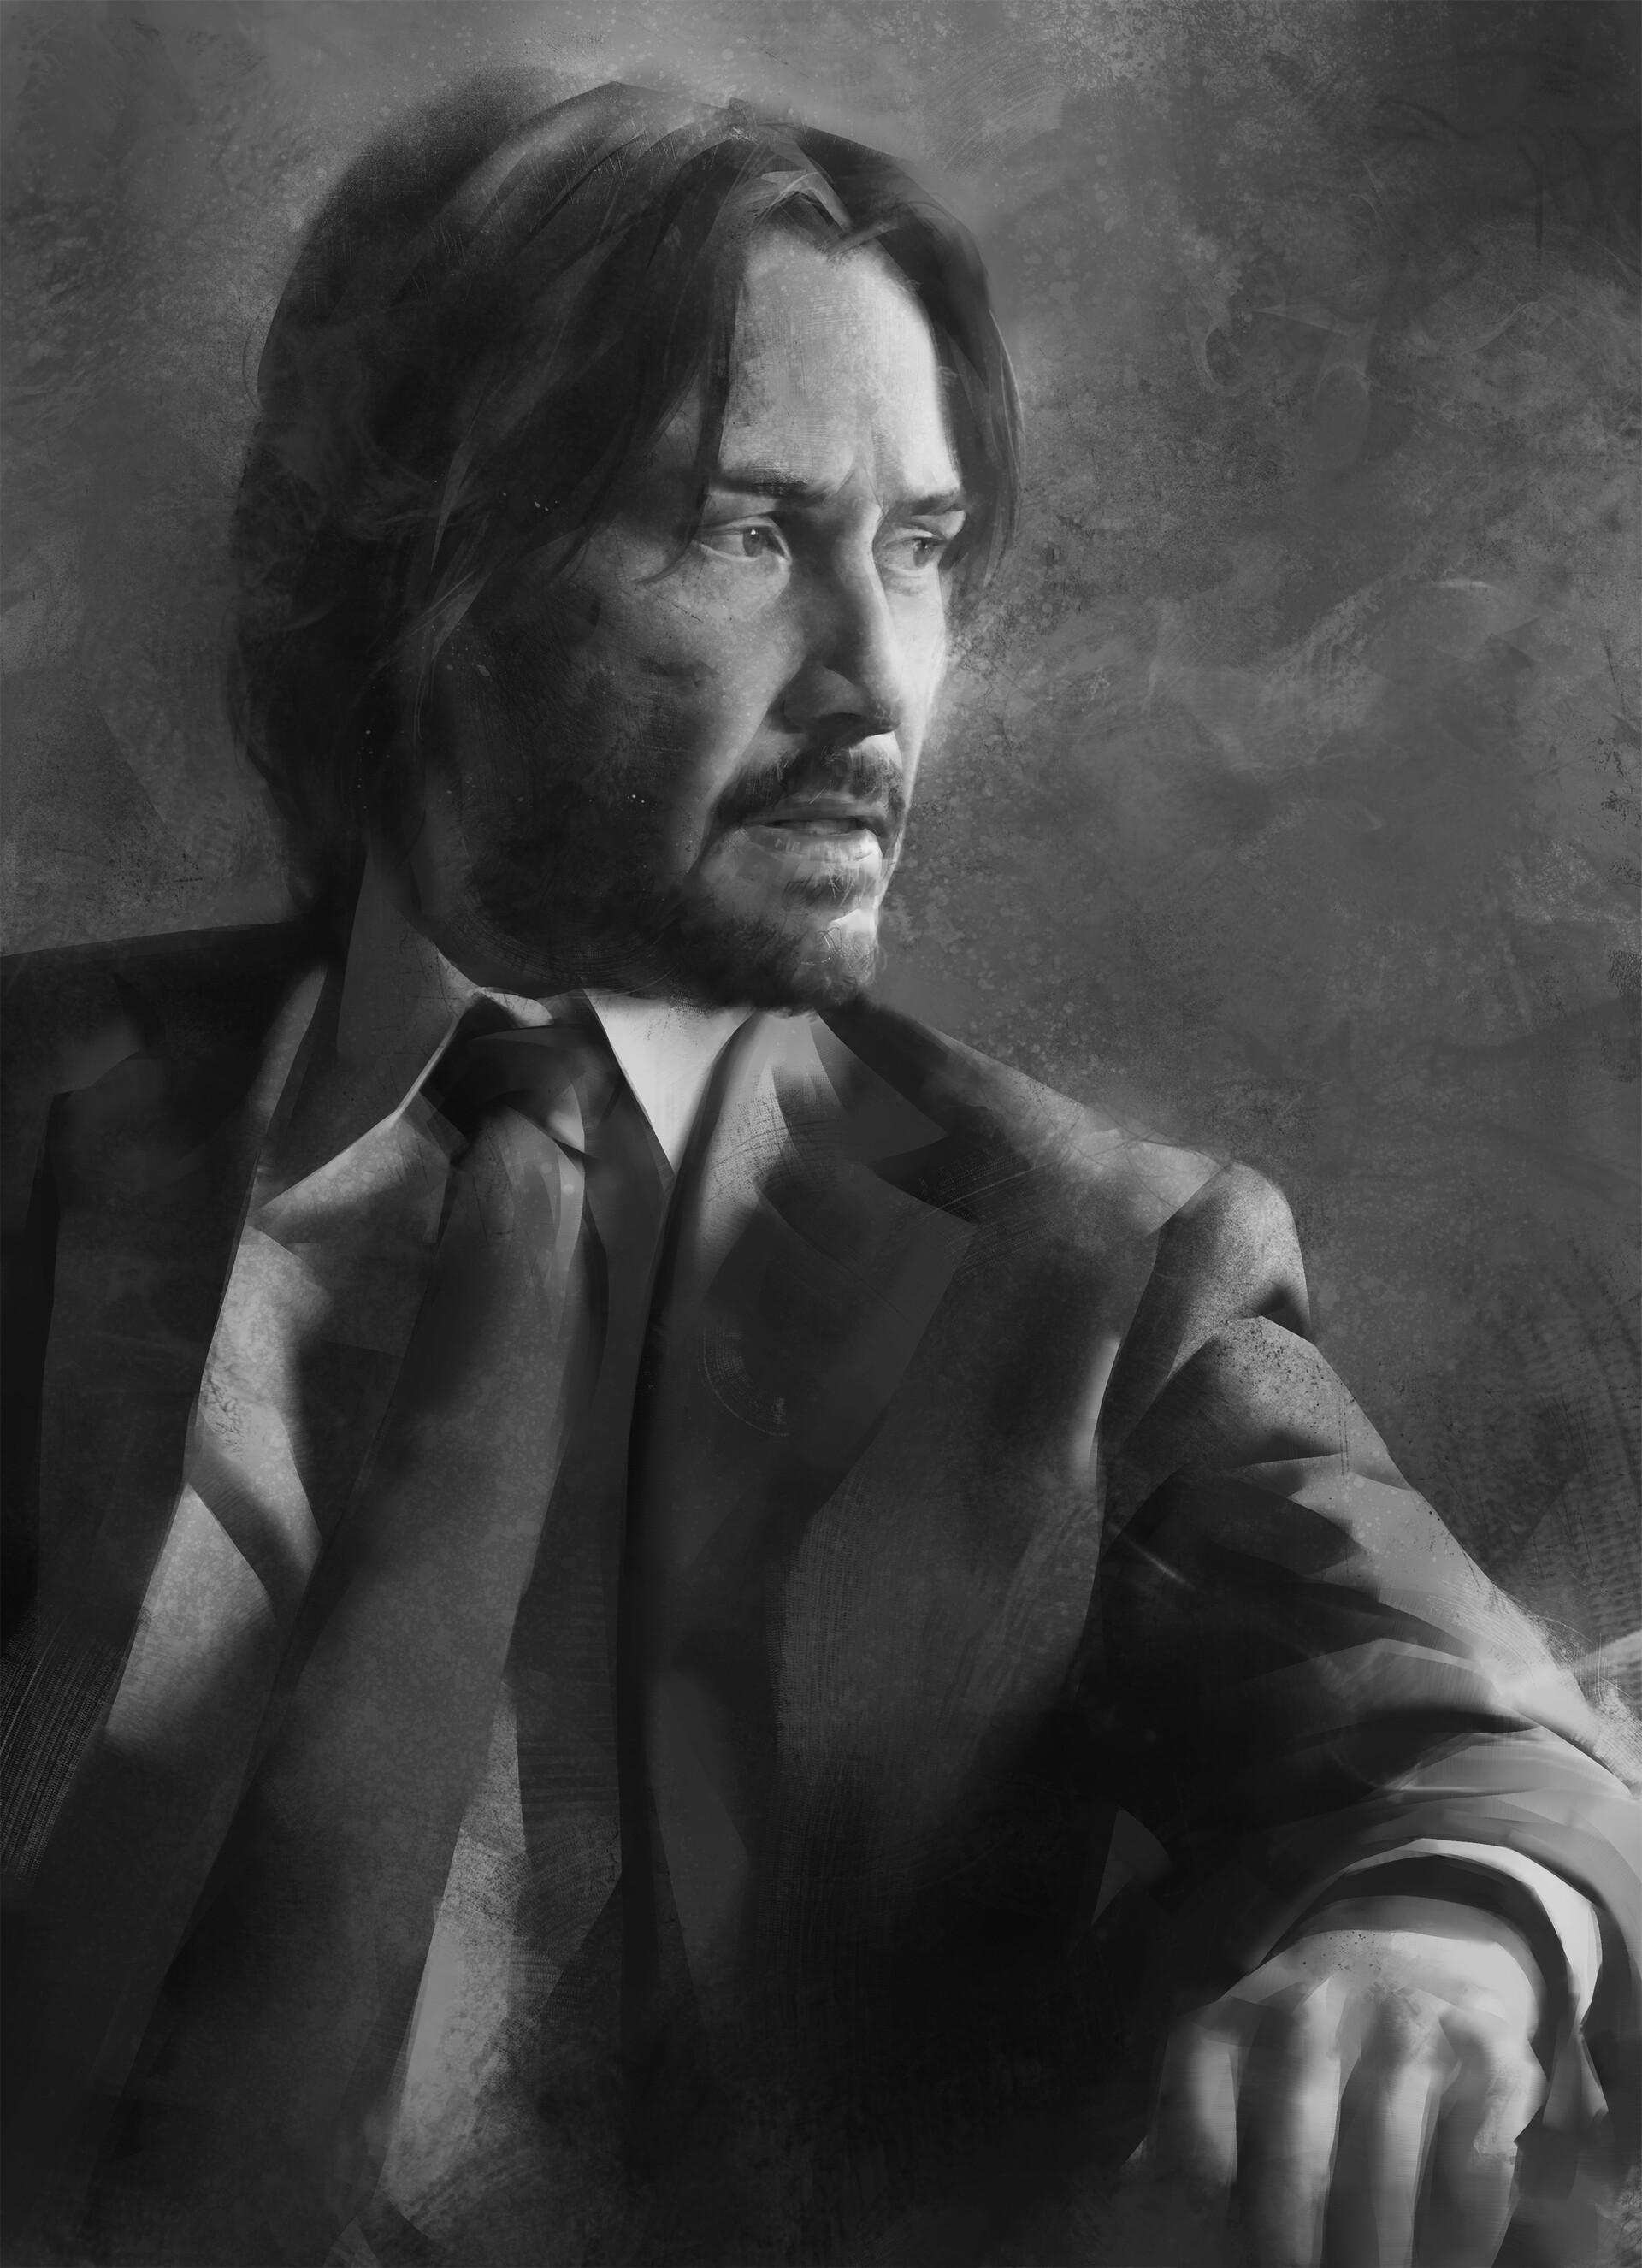 Tim Liu Digital Painting Digital Art Portrait Display Fan Art Looking At The Side Keanu Reeves ArtSt 1920x2652